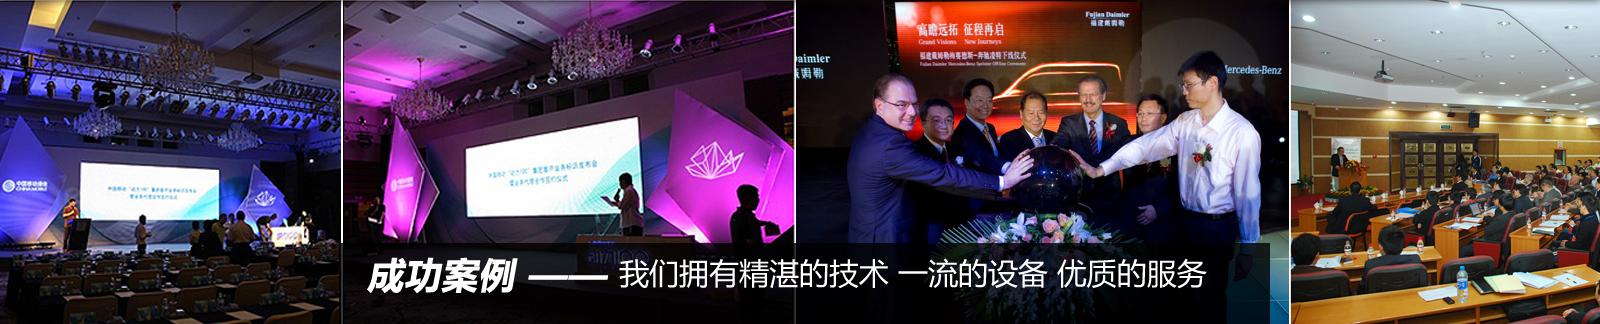 ca88亚洲城娱乐最新备用网址下载_上海LED租赁,上海亚洲城备用网址租赁